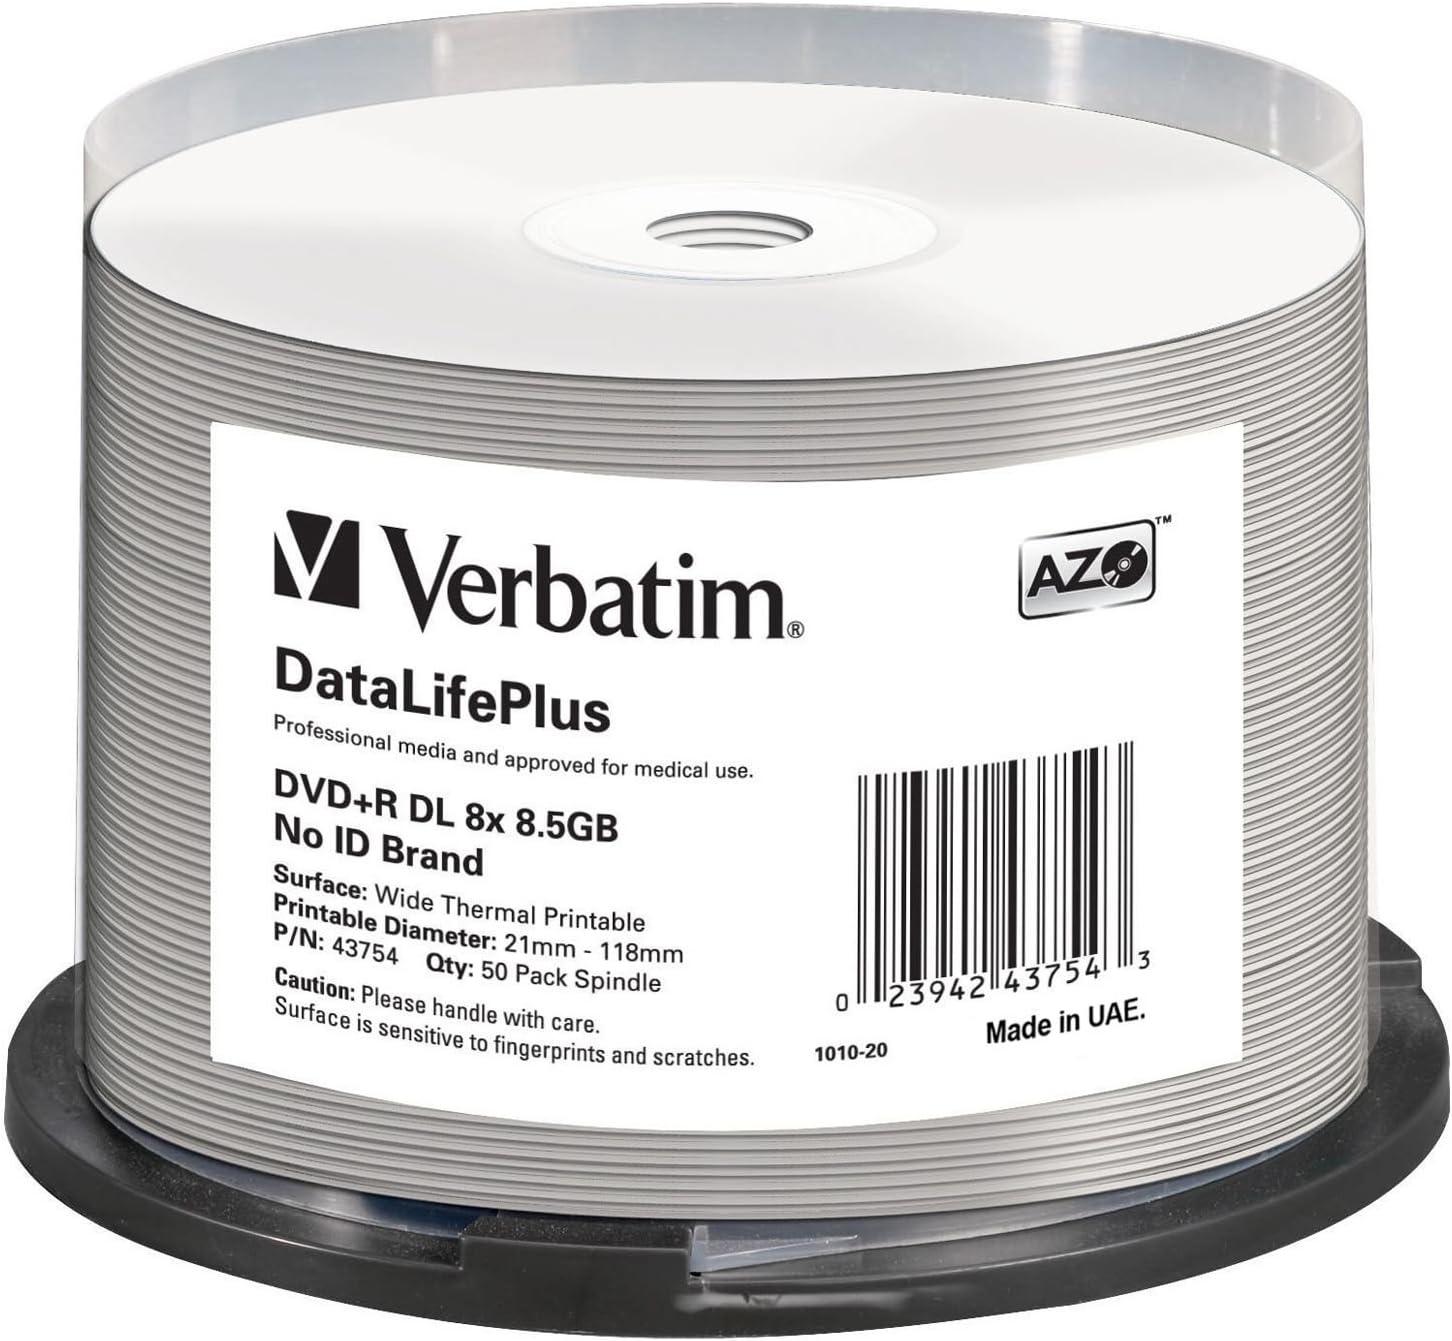 Verbatim Dvd R 8x Double Layer Wide Thermal Printable 8 5gb I Datalifeplus I 50er Pack Spindel I Dvd Rohlinge Thermal Bedruckbar I 8 Fache Brenngeschwindigkeit I Dvd R Printable I Dvd Leer Audio